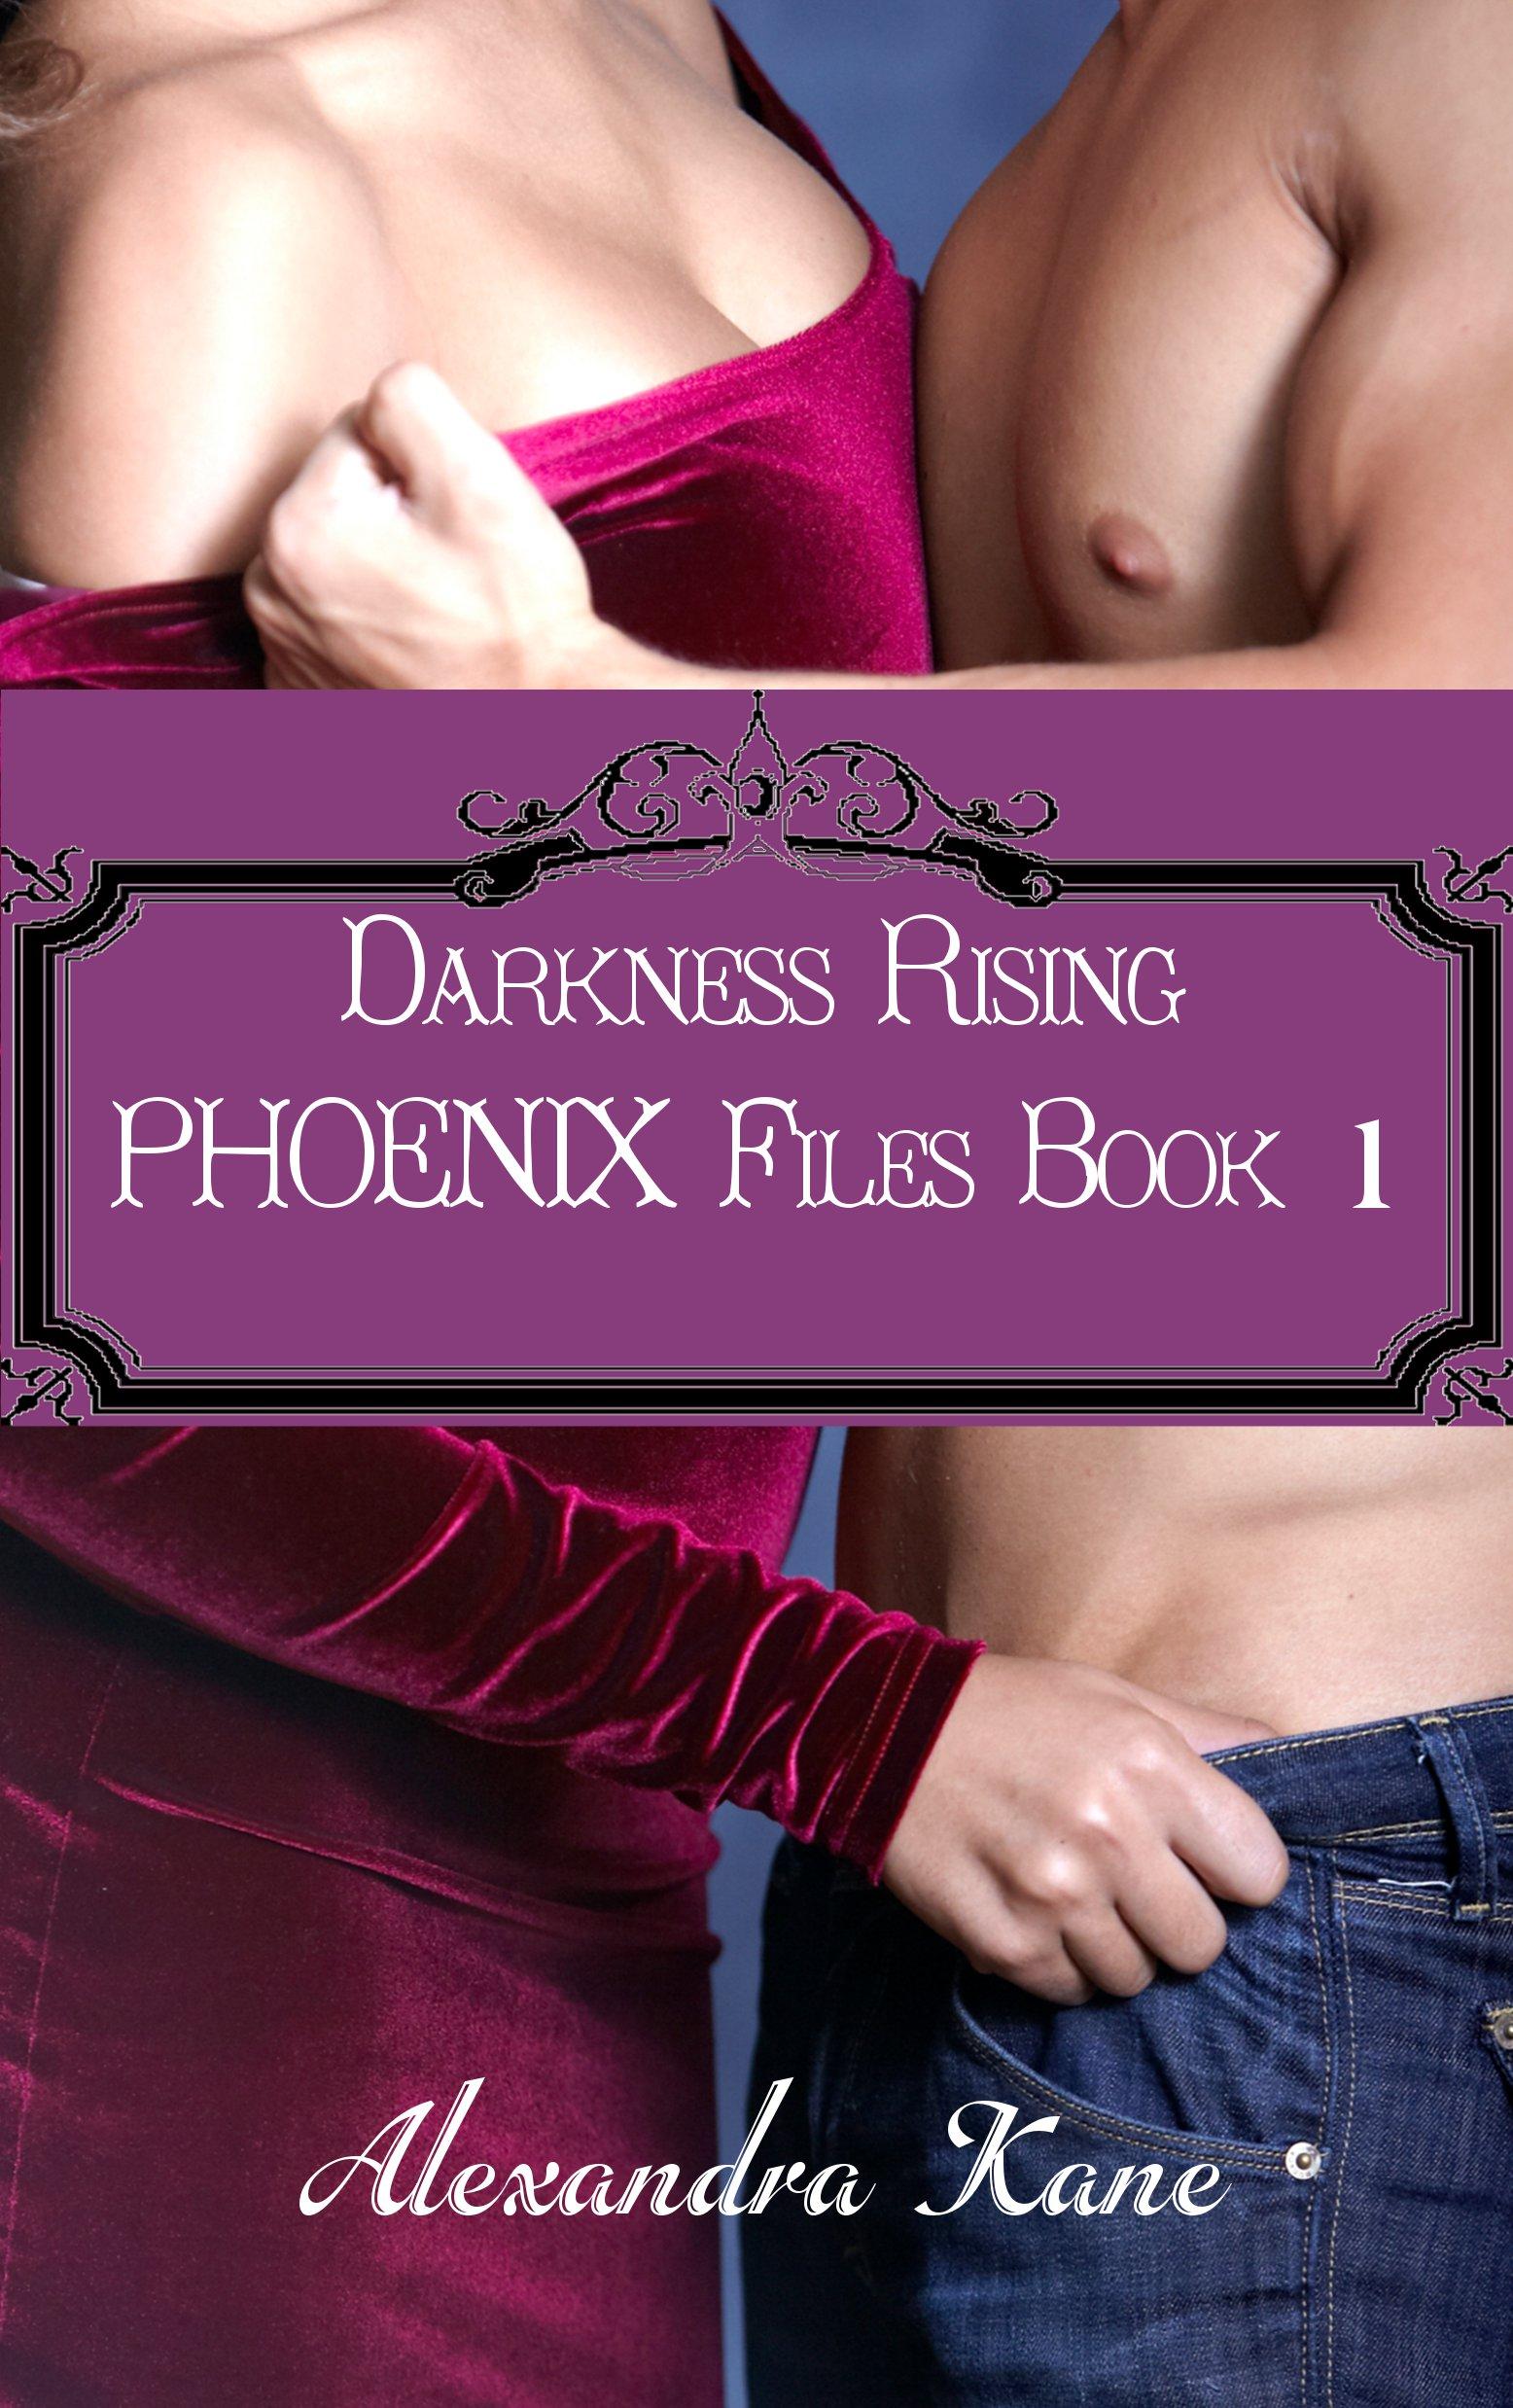 Darkness Rising: PHOENIX Files Book 1